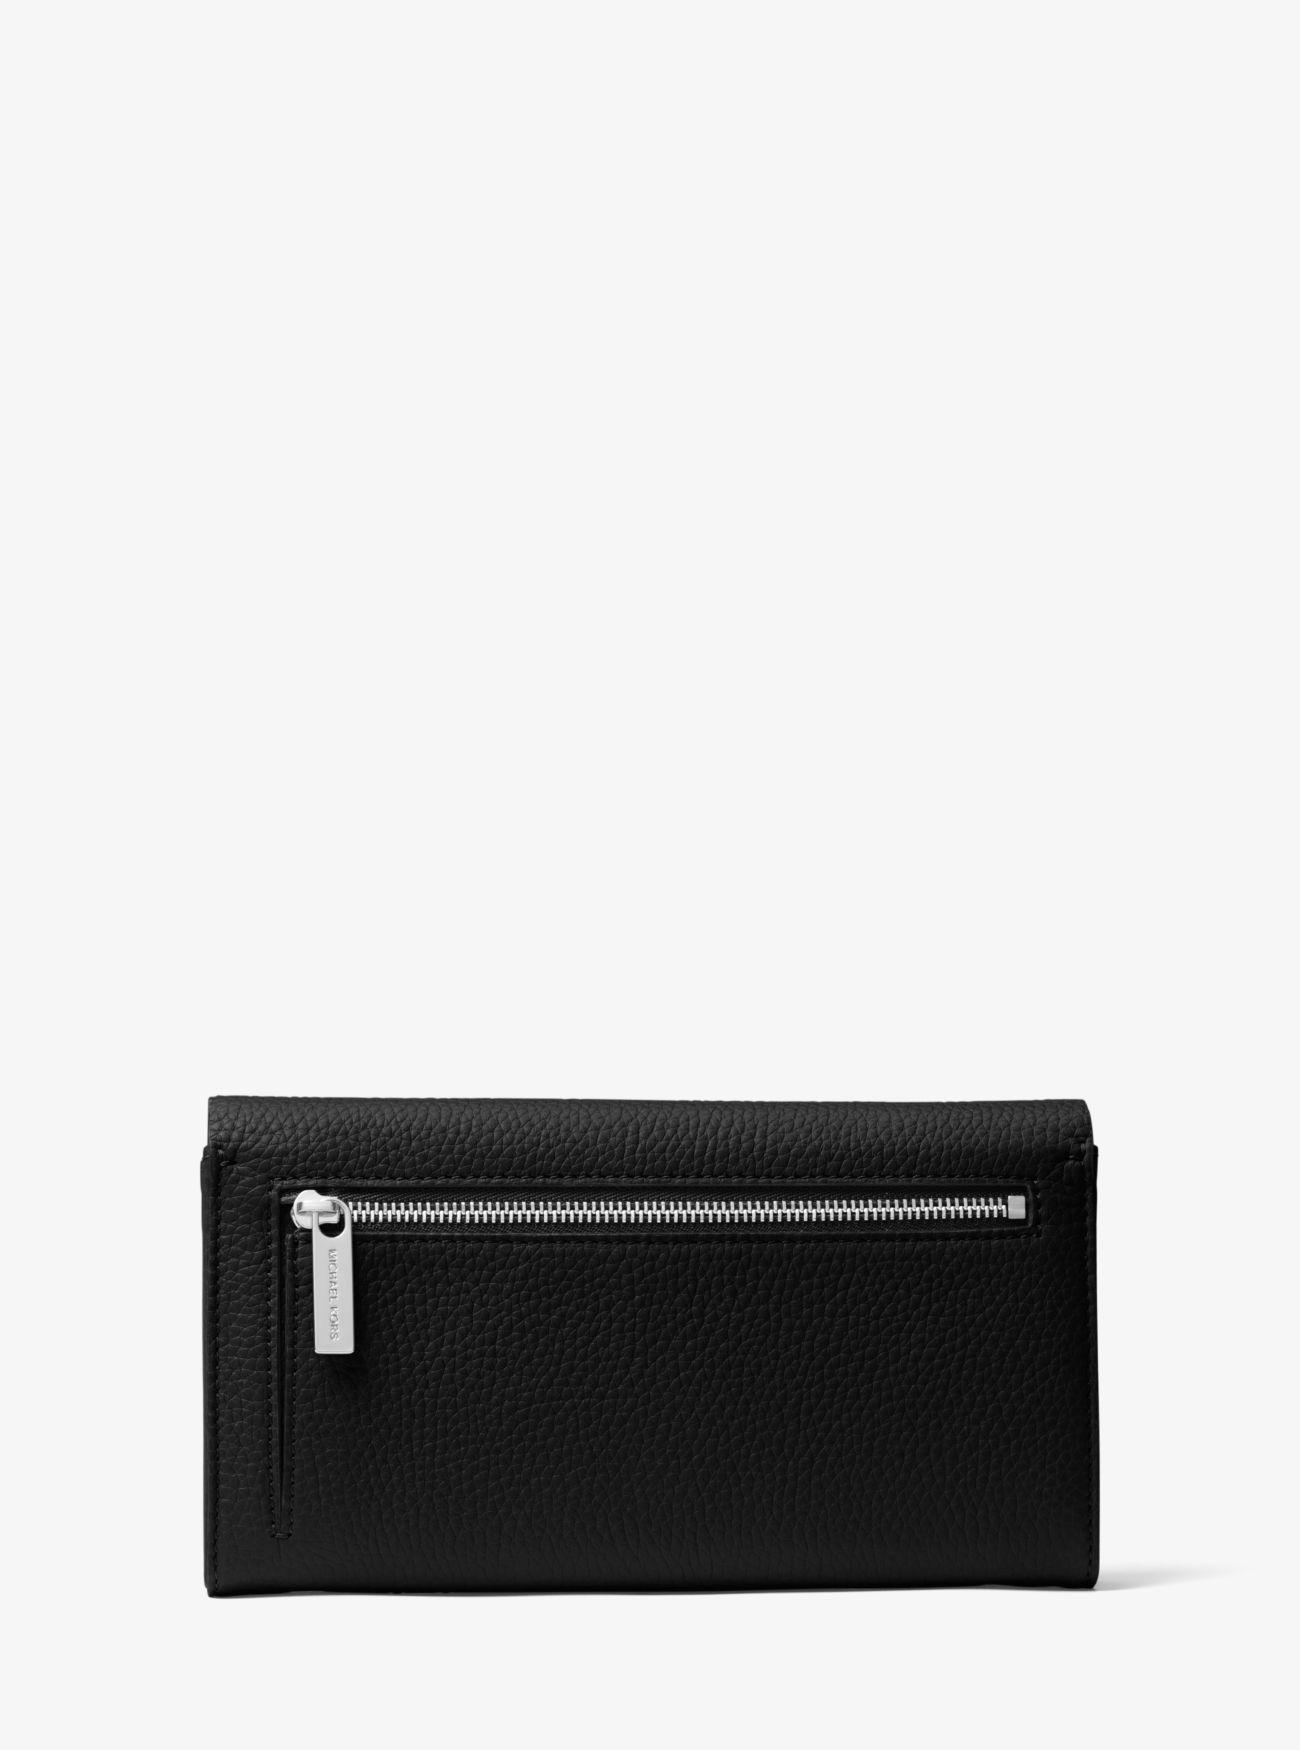 0a573baa739e73 ... Bancroft Pebbled Calf Leather Continental Wallet. Michael Kors  Collection